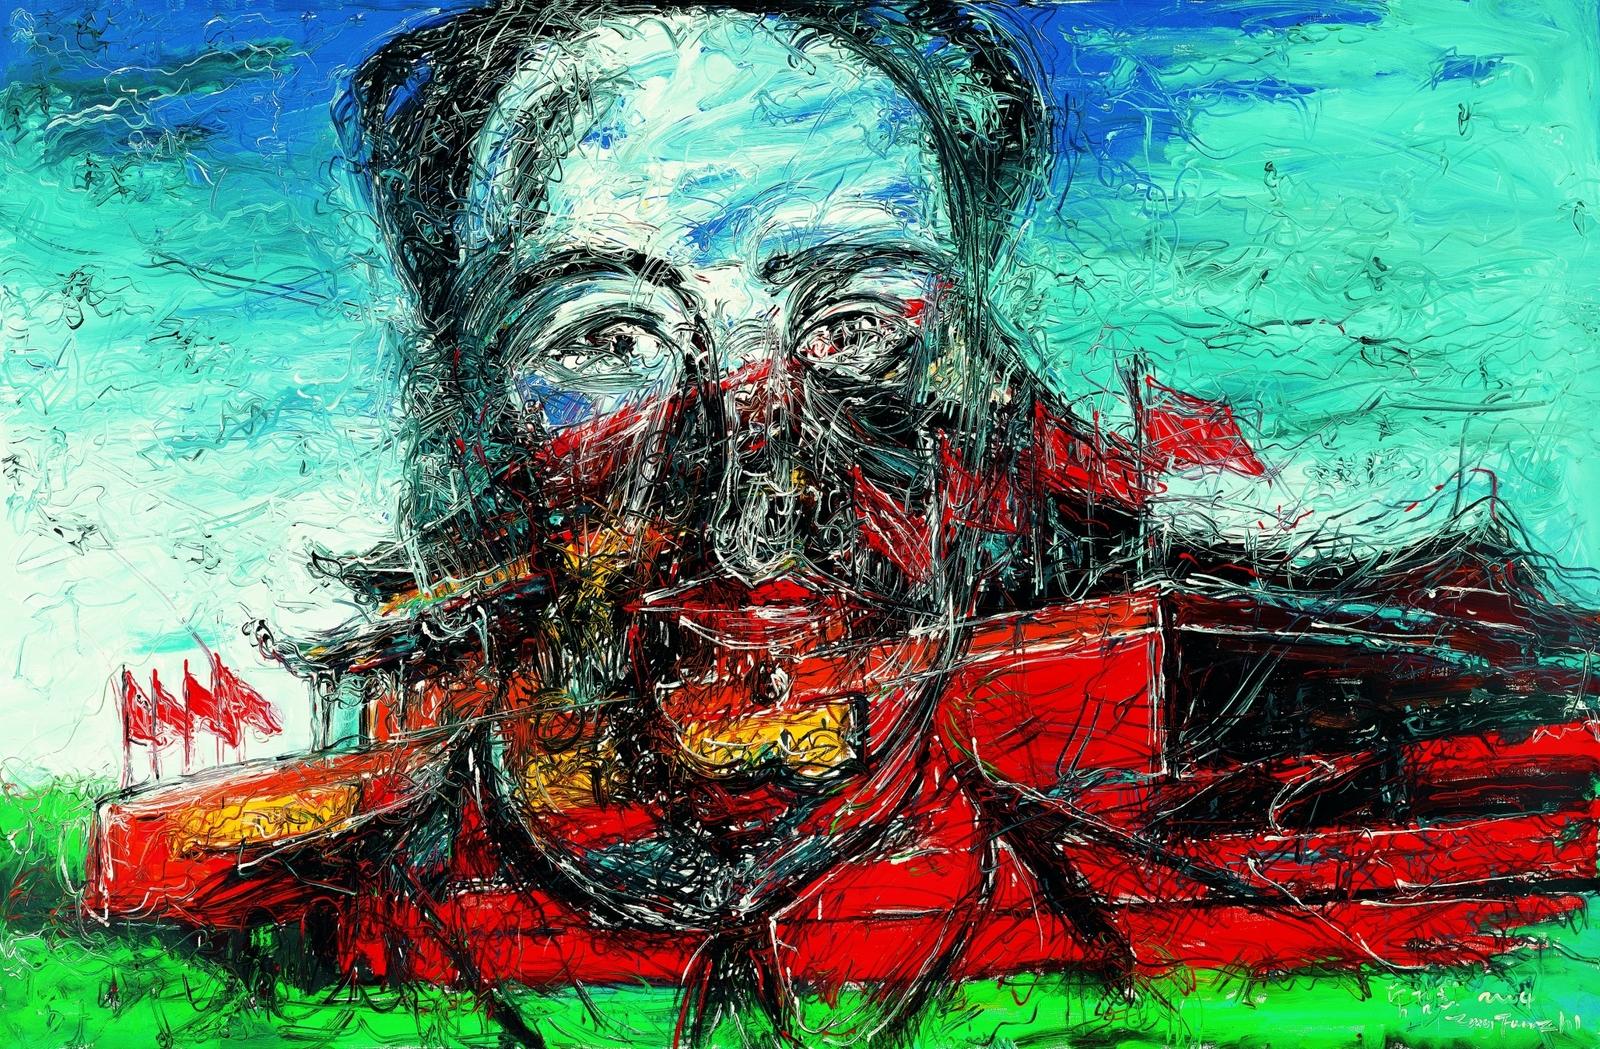 2004_Тяньаньмэнь (Tiananmen)_21.5х 33_х.,м._Частное собрание.jpg